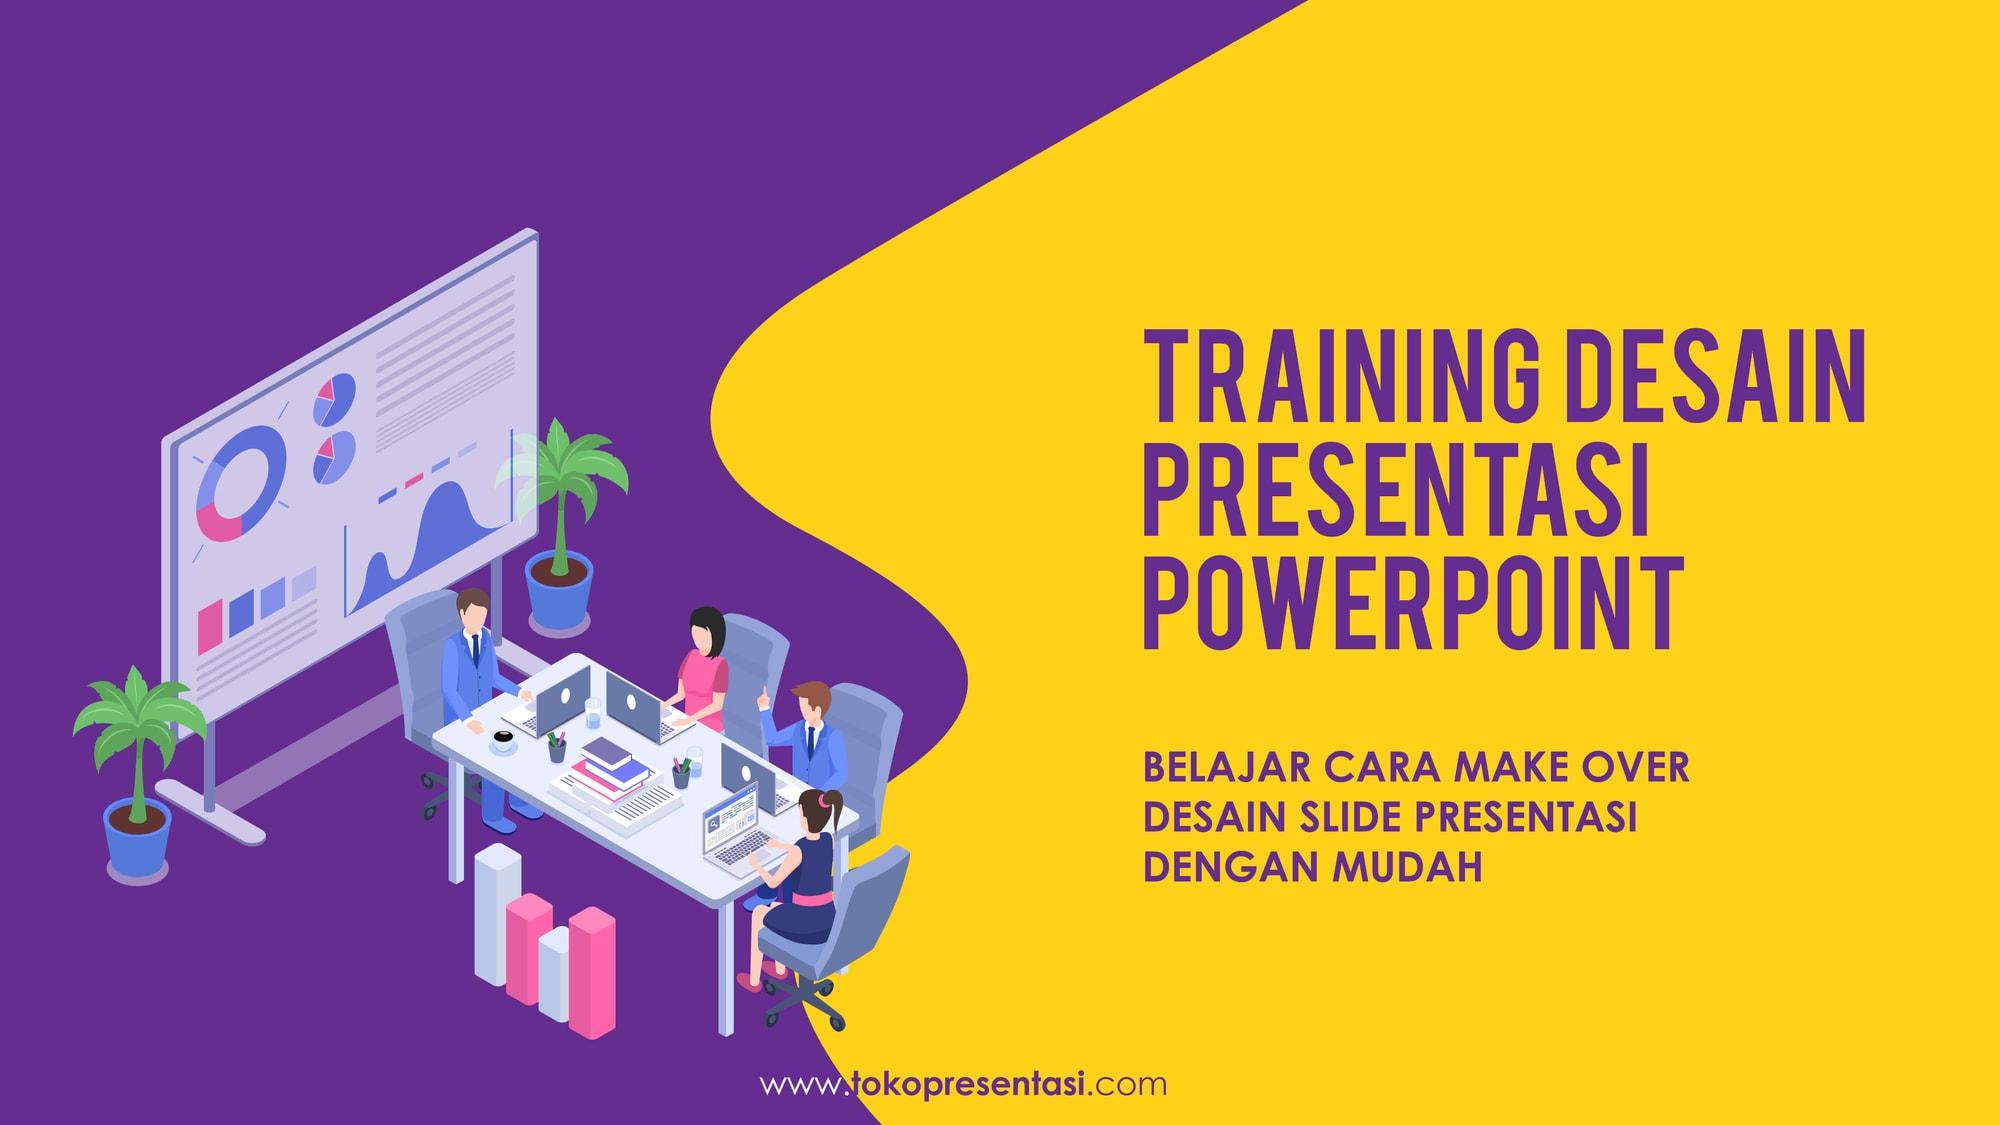 Pelatihan Desain Presentasi PowerPoint Mahkamah Konstitusi Tokopresentasi